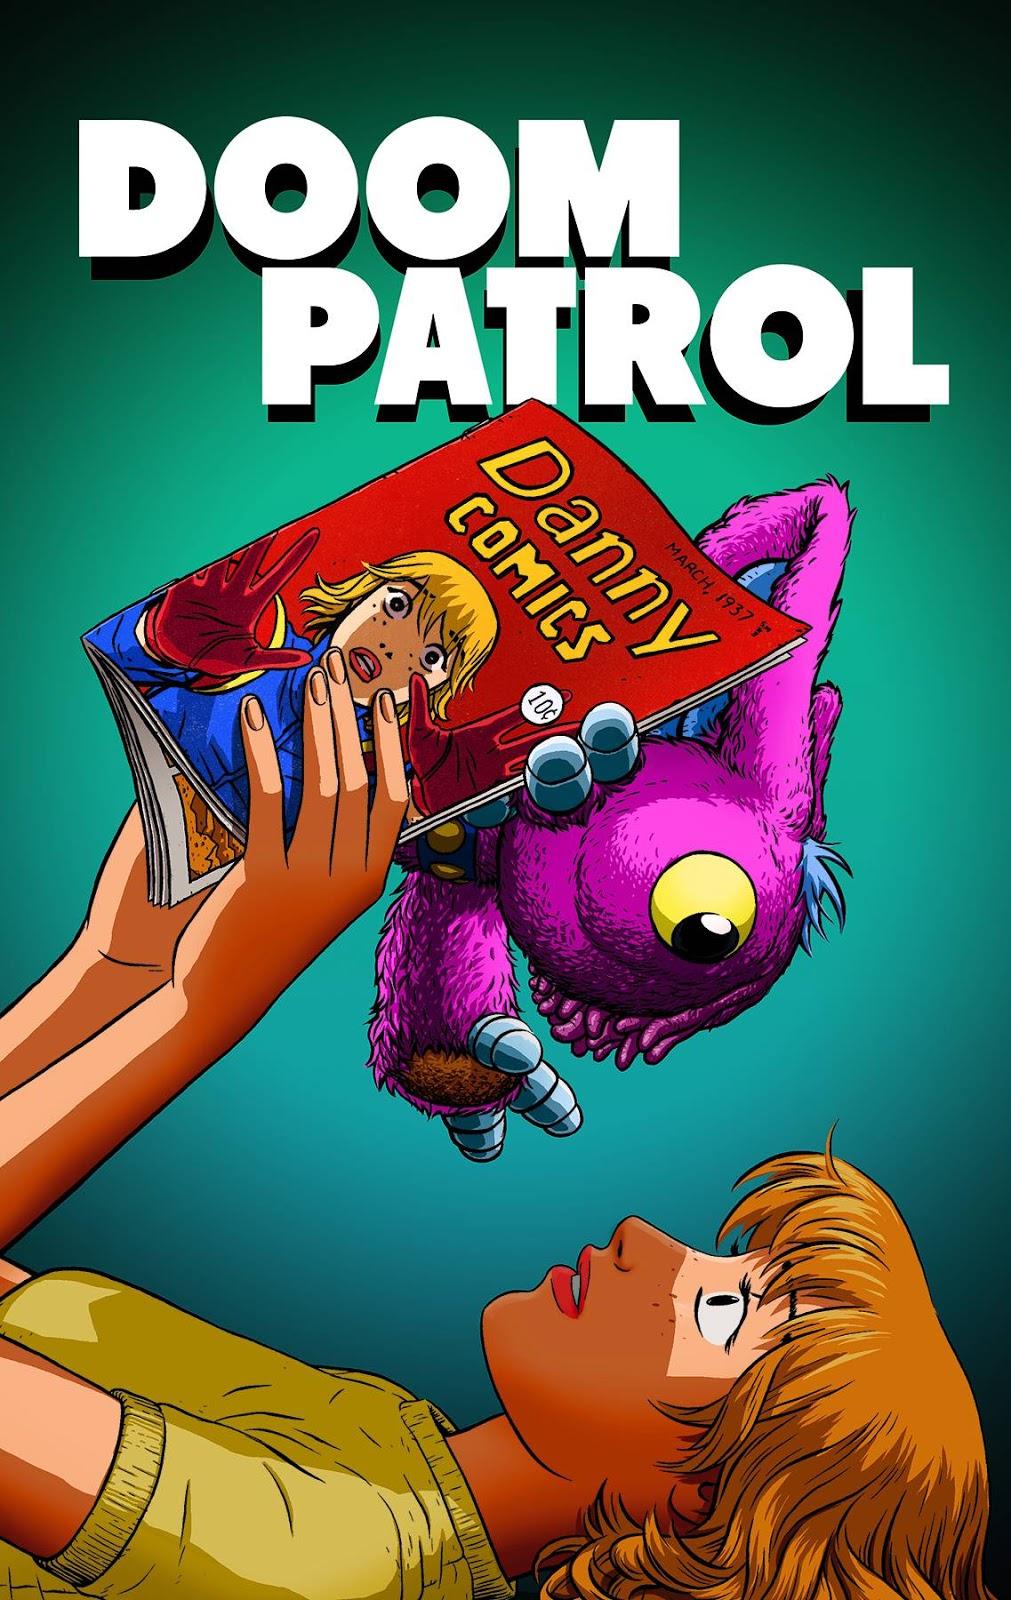 doom patrol - photo #18